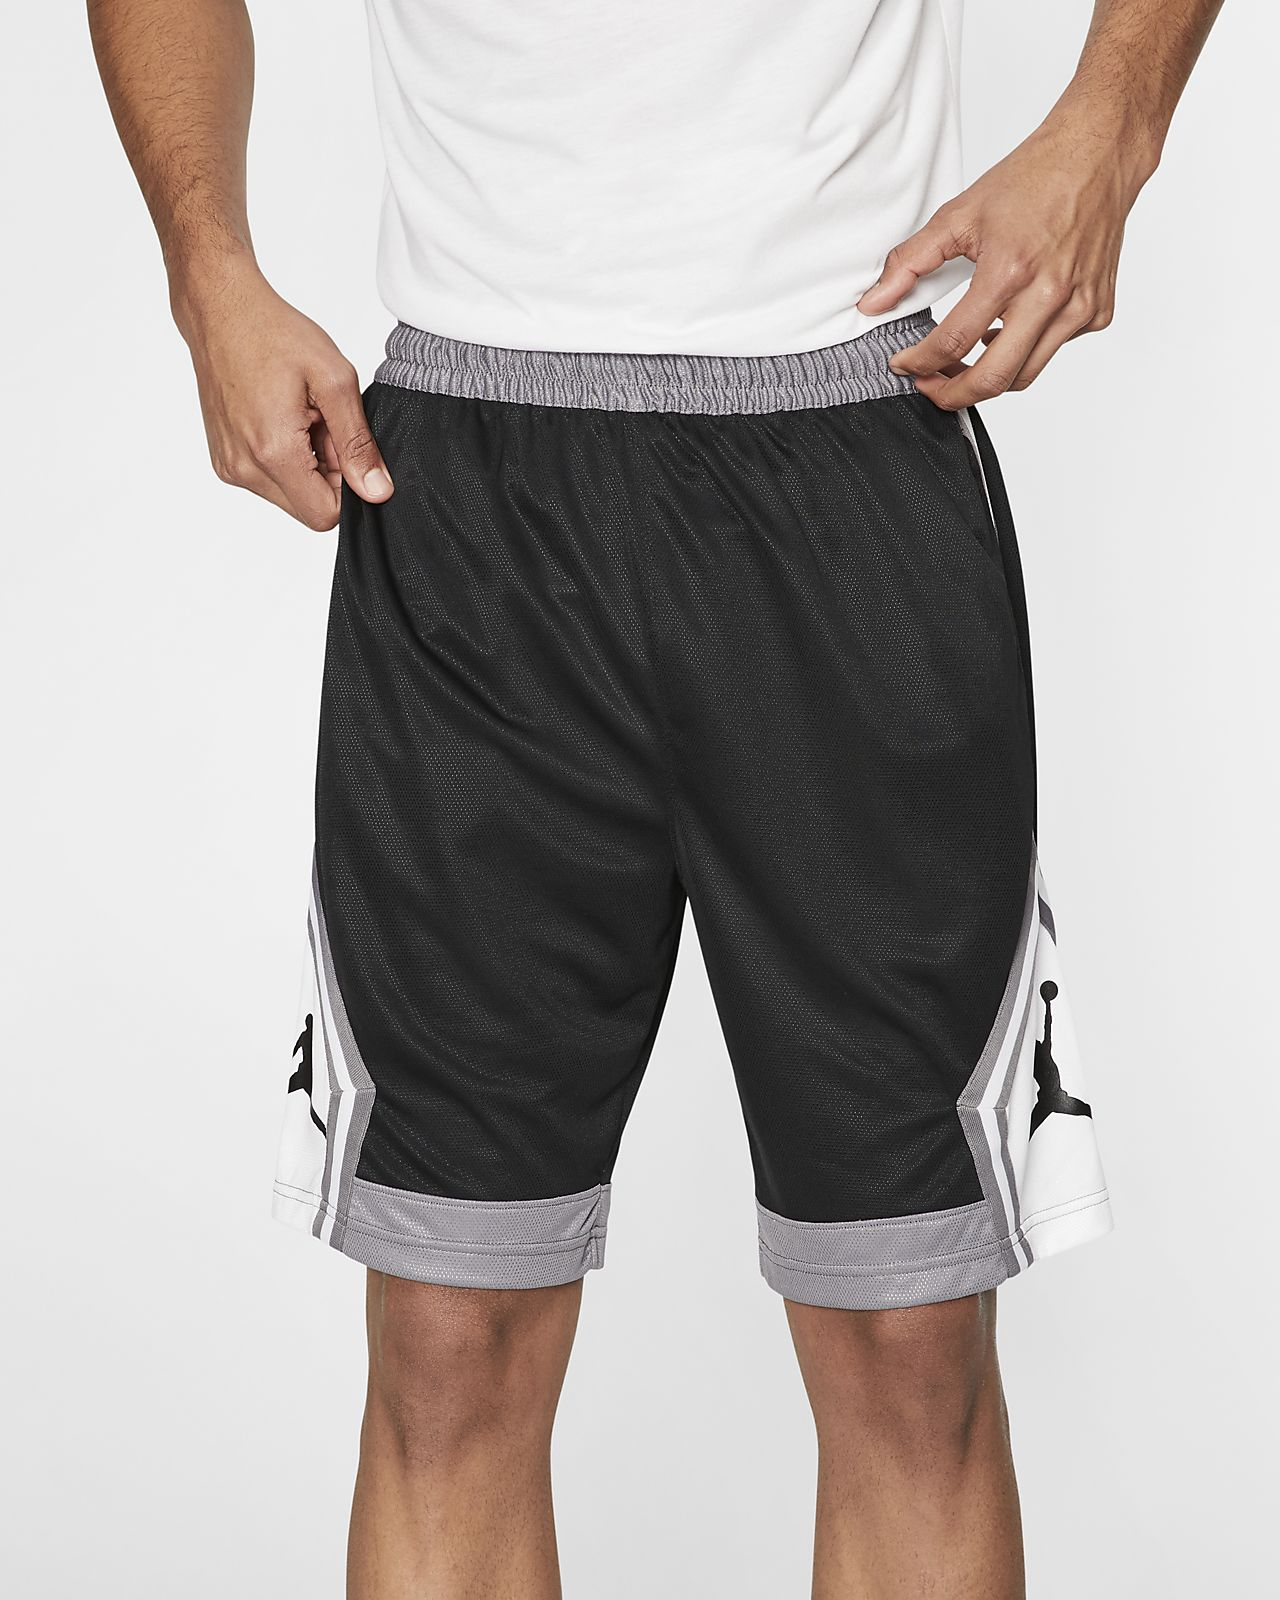 Shorts de básquetbol a rayas para hombre Jordan Jumpman Diamond